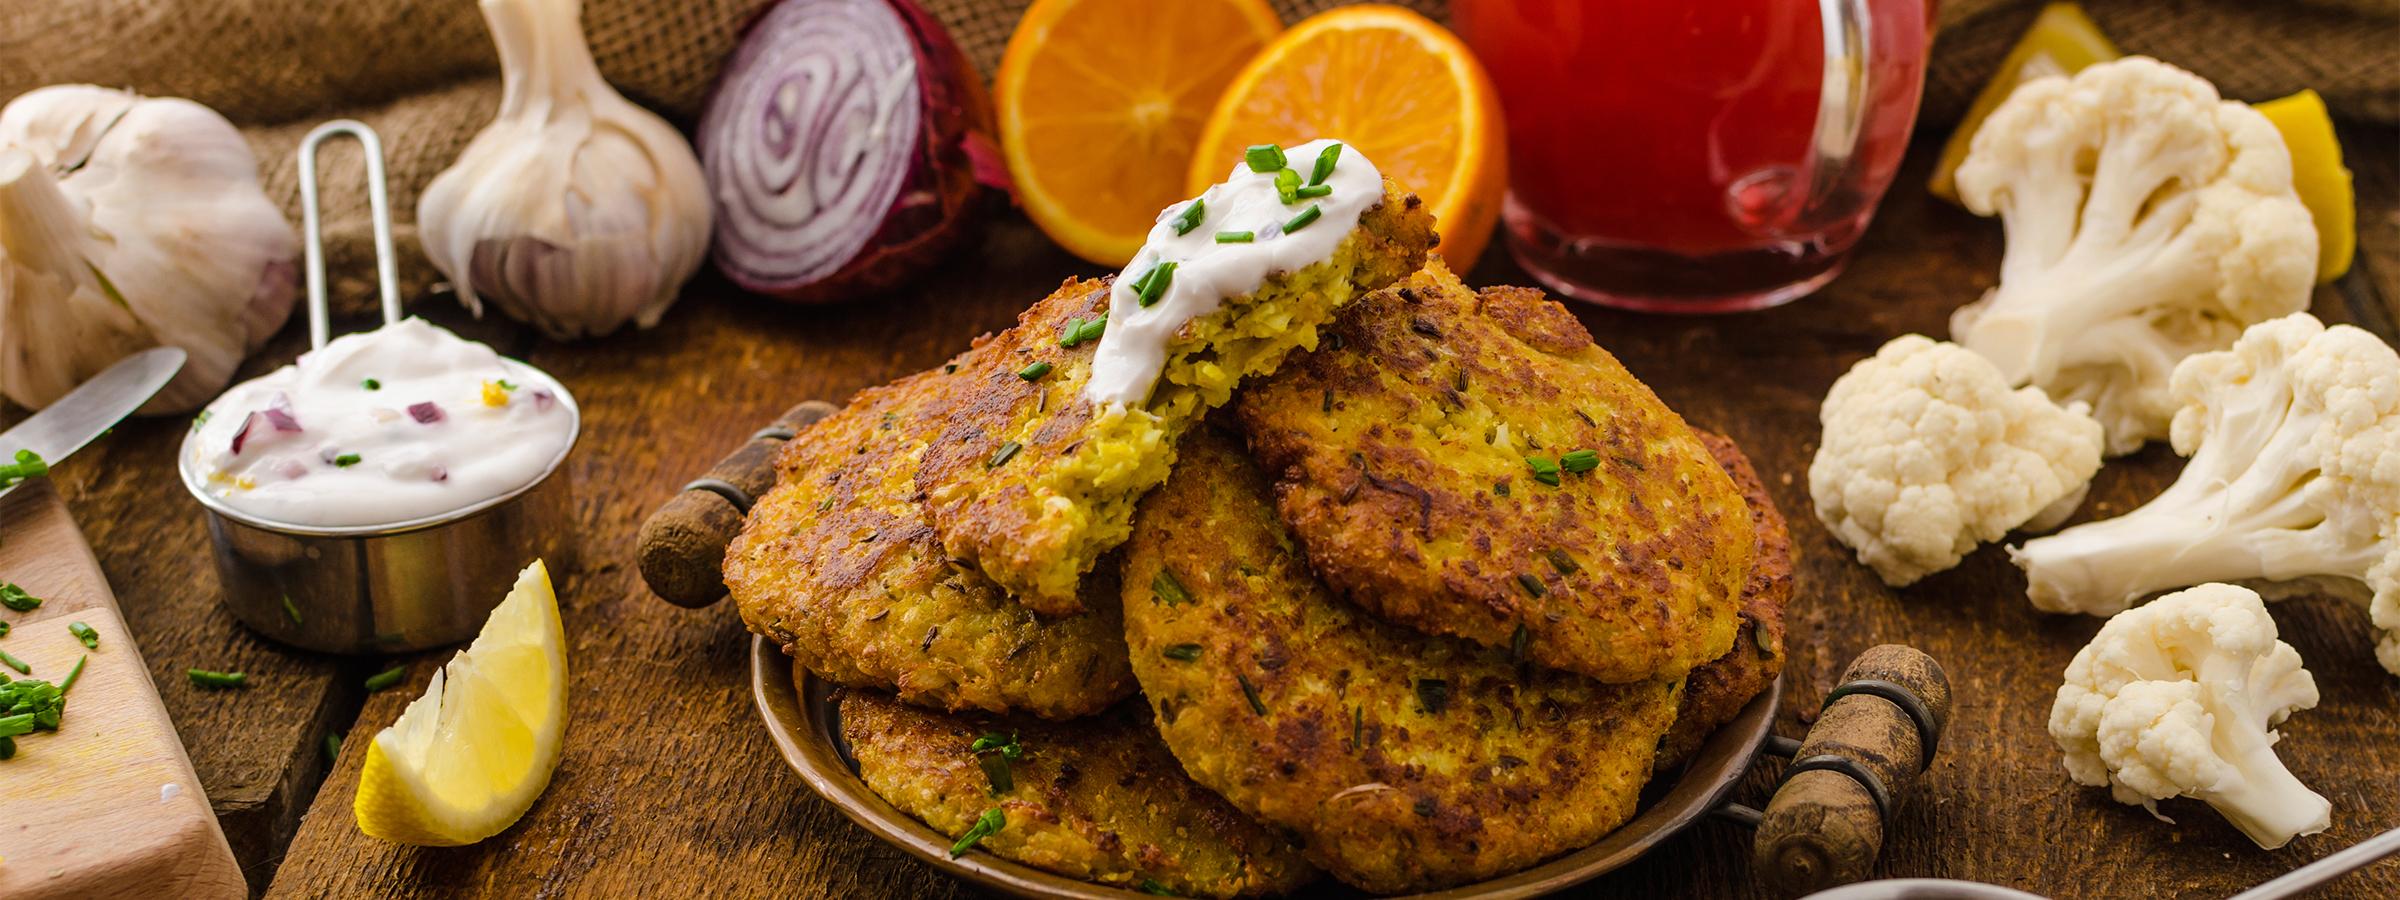 tamari cauliflower fritter featured